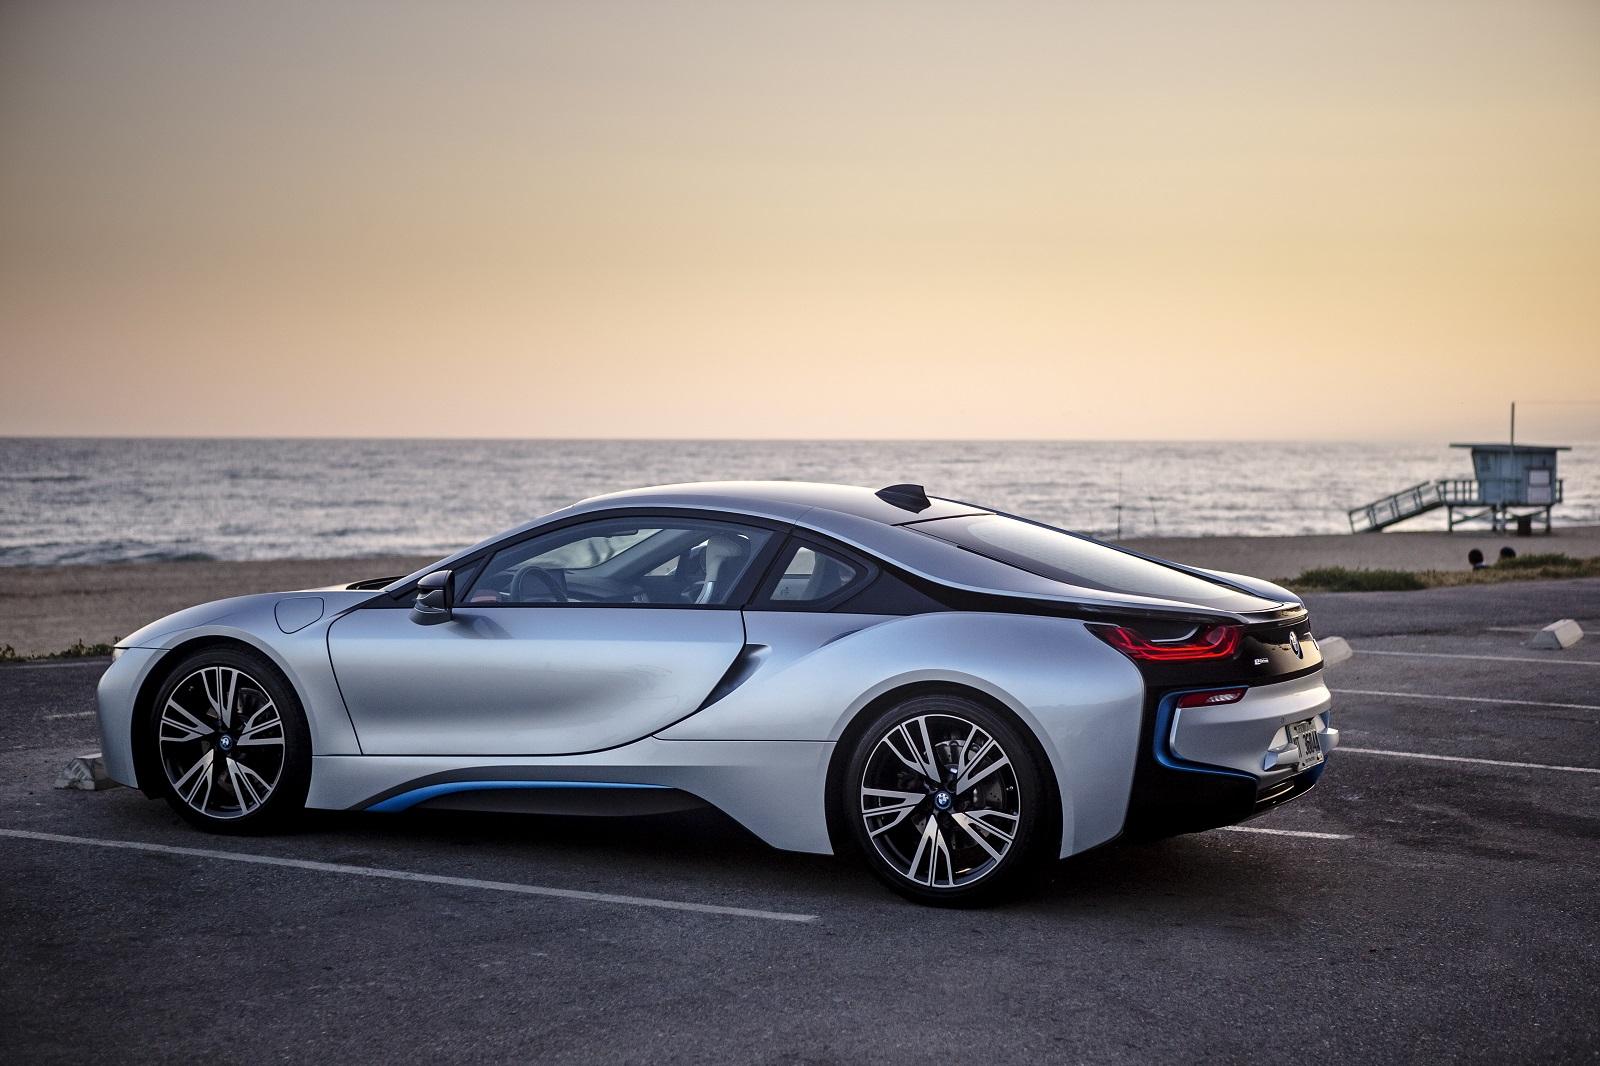 BMW Holds On To U.S. Luxury Car Sales Crown In 2015, Lexus